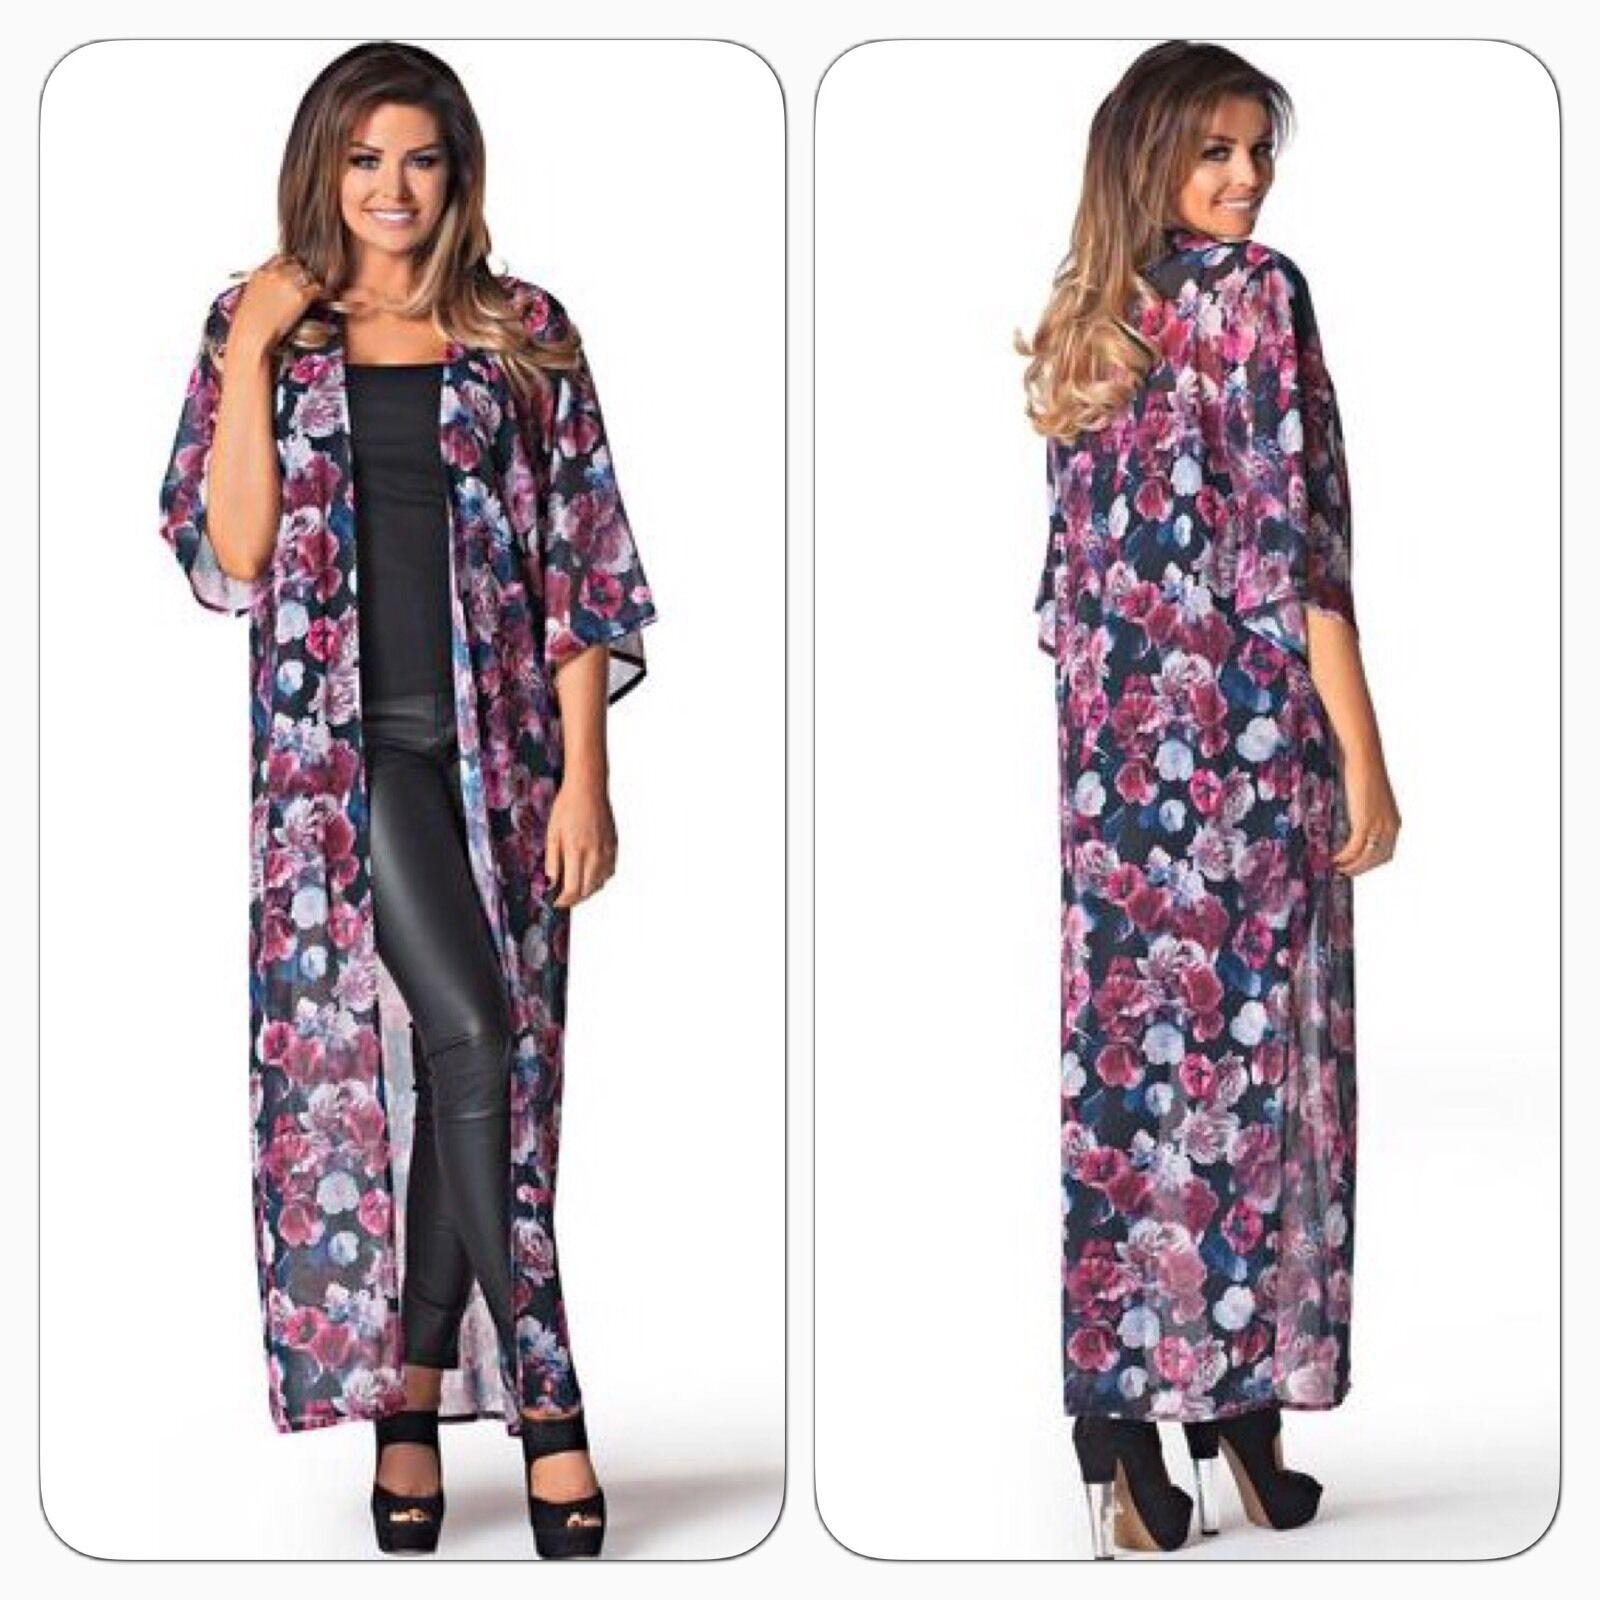 BNWT Jessica Wright Kimmy Long Line Dark Floral Print Evening Kimono S M 8 10 12